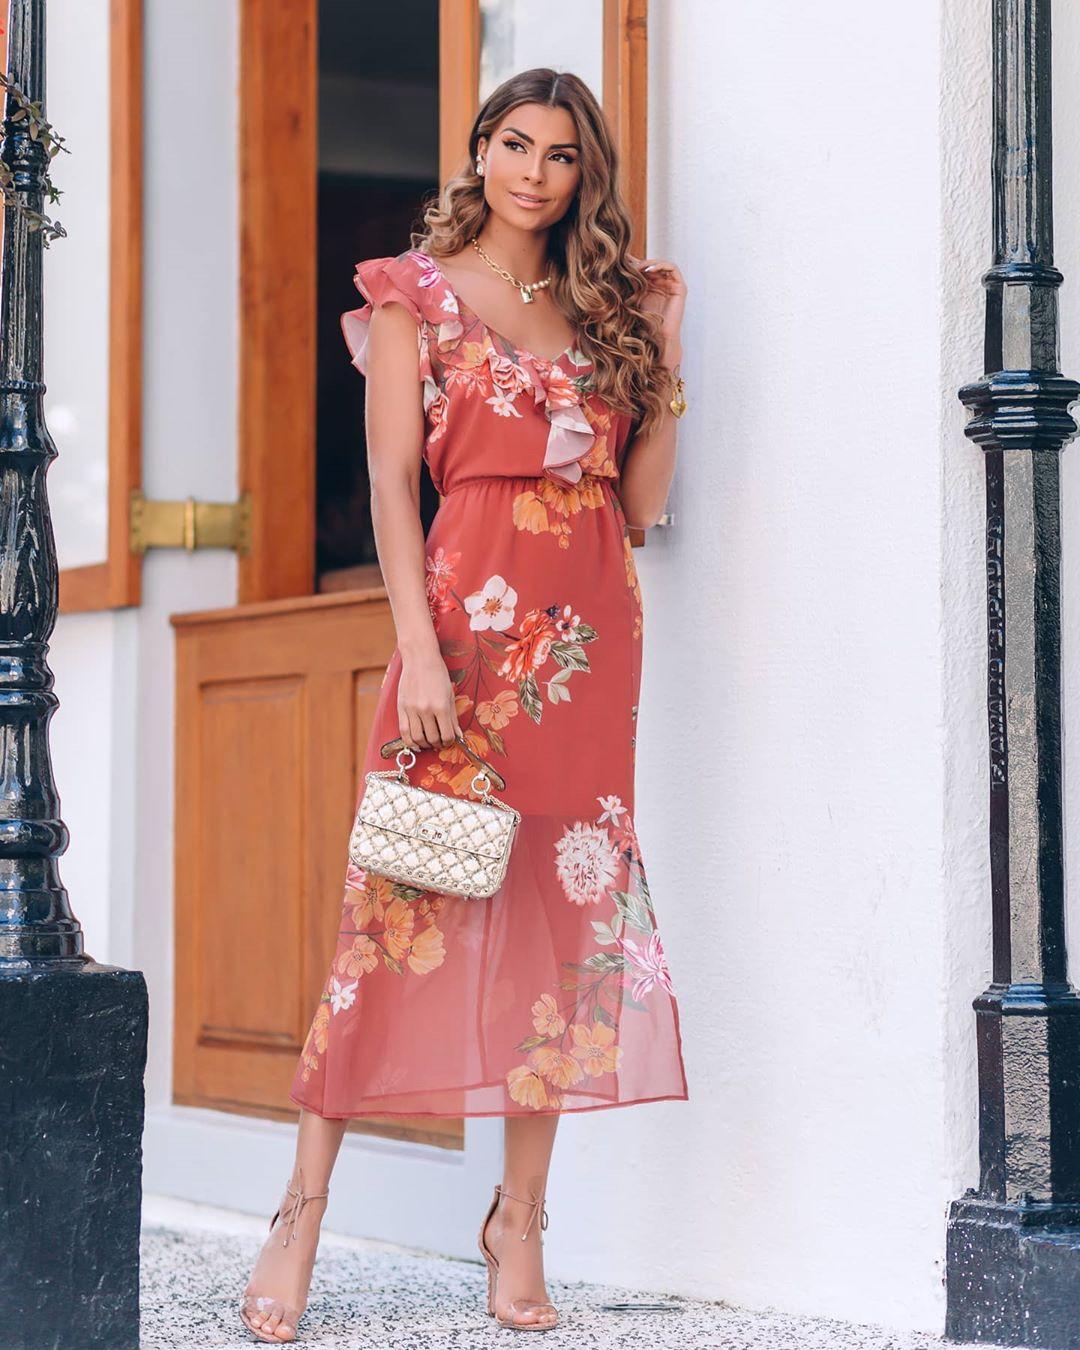 Vestido Midi Chiffon Floral com Jabots e Docote V Doce Flor